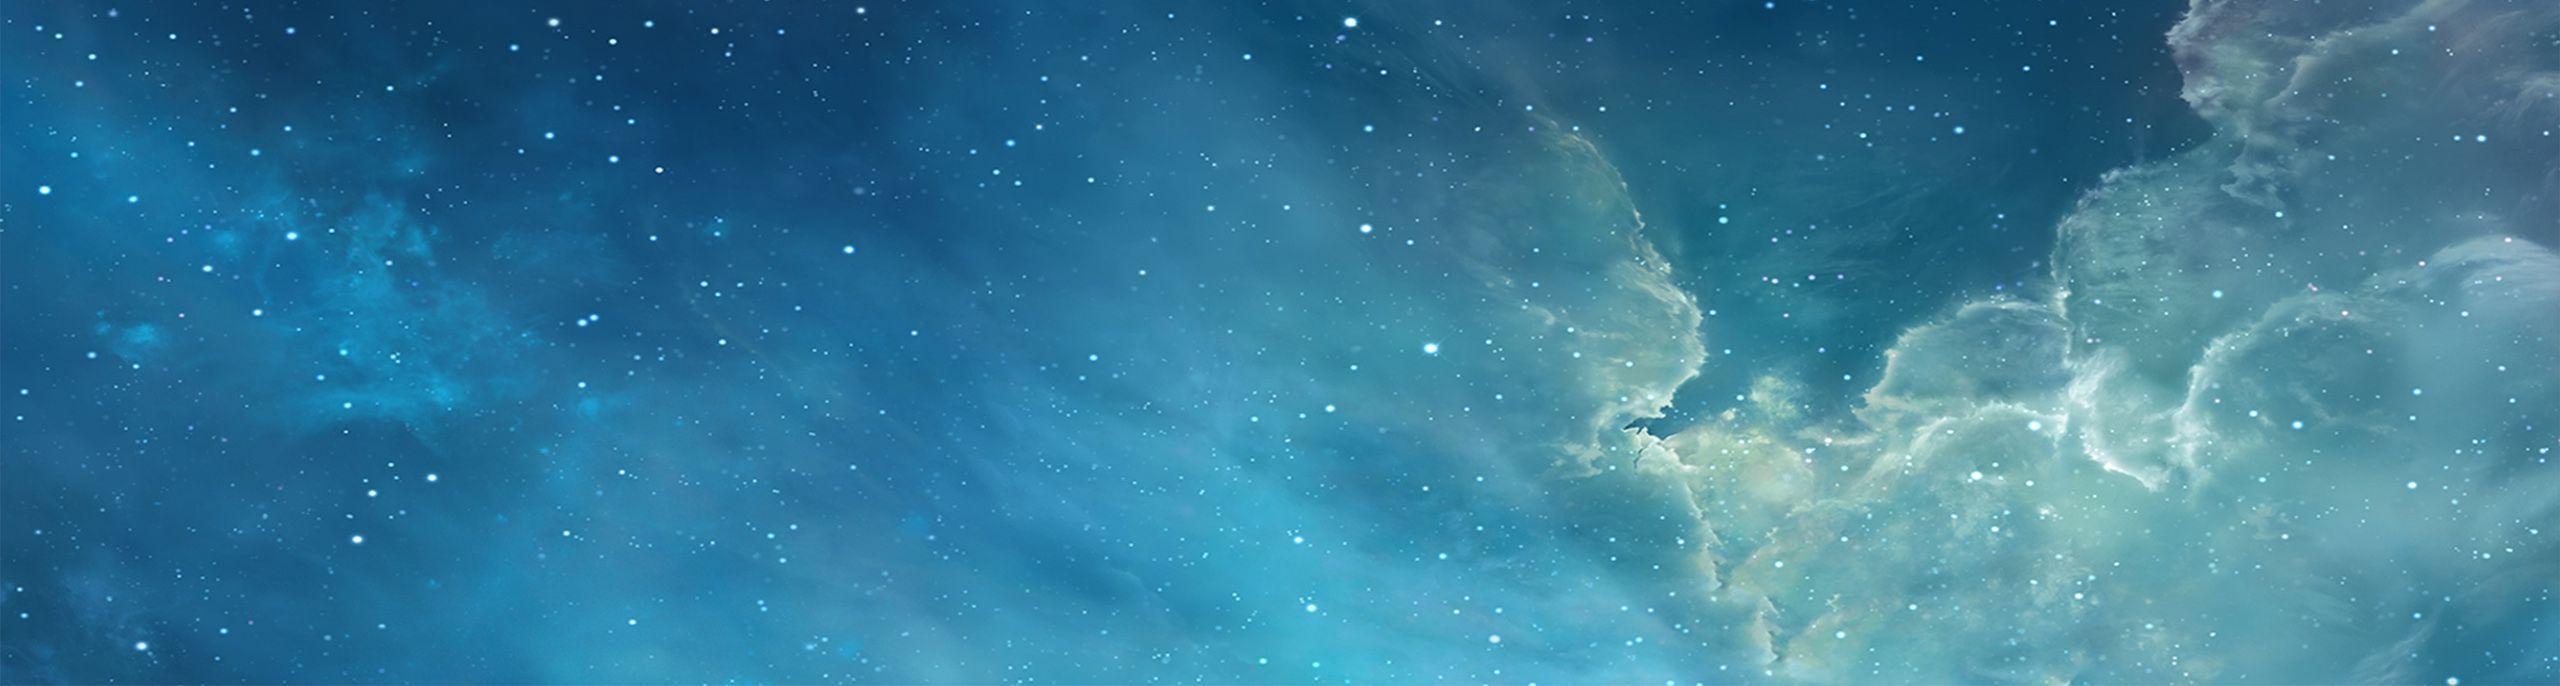 blue night sky background - photo #47